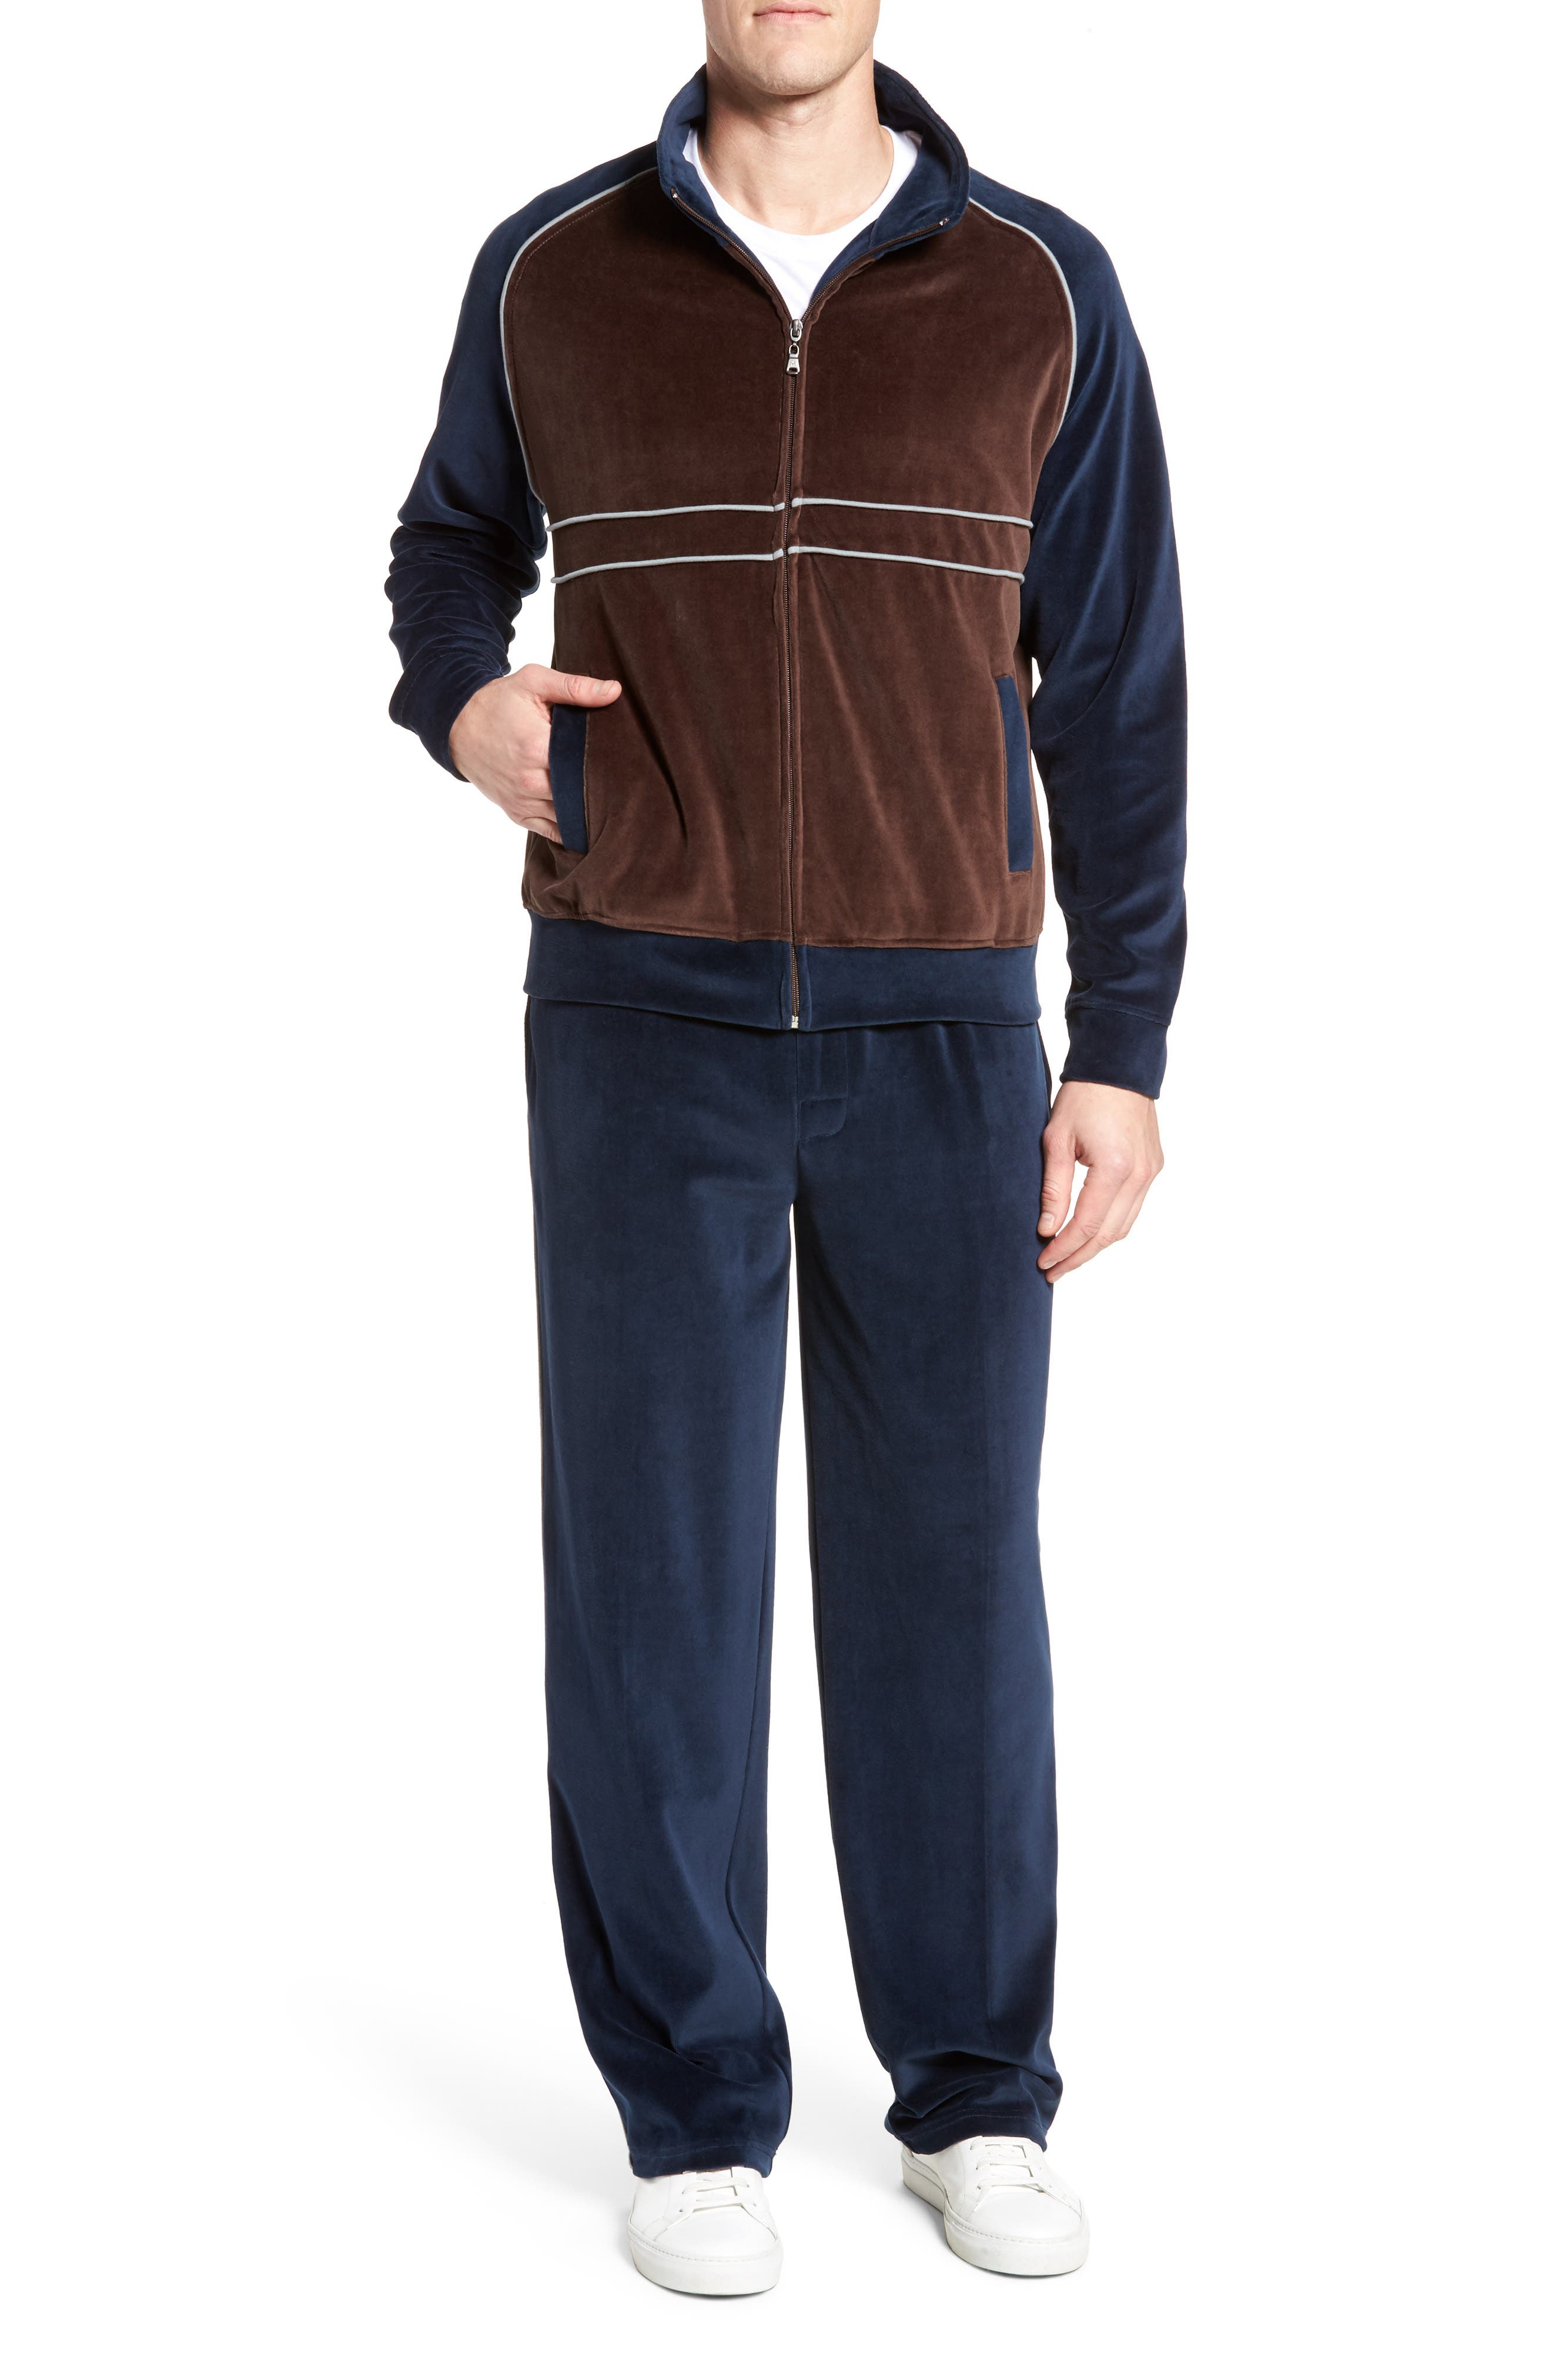 Strathcona Velour Warm-Up Suit,                             Main thumbnail 1, color,                             410